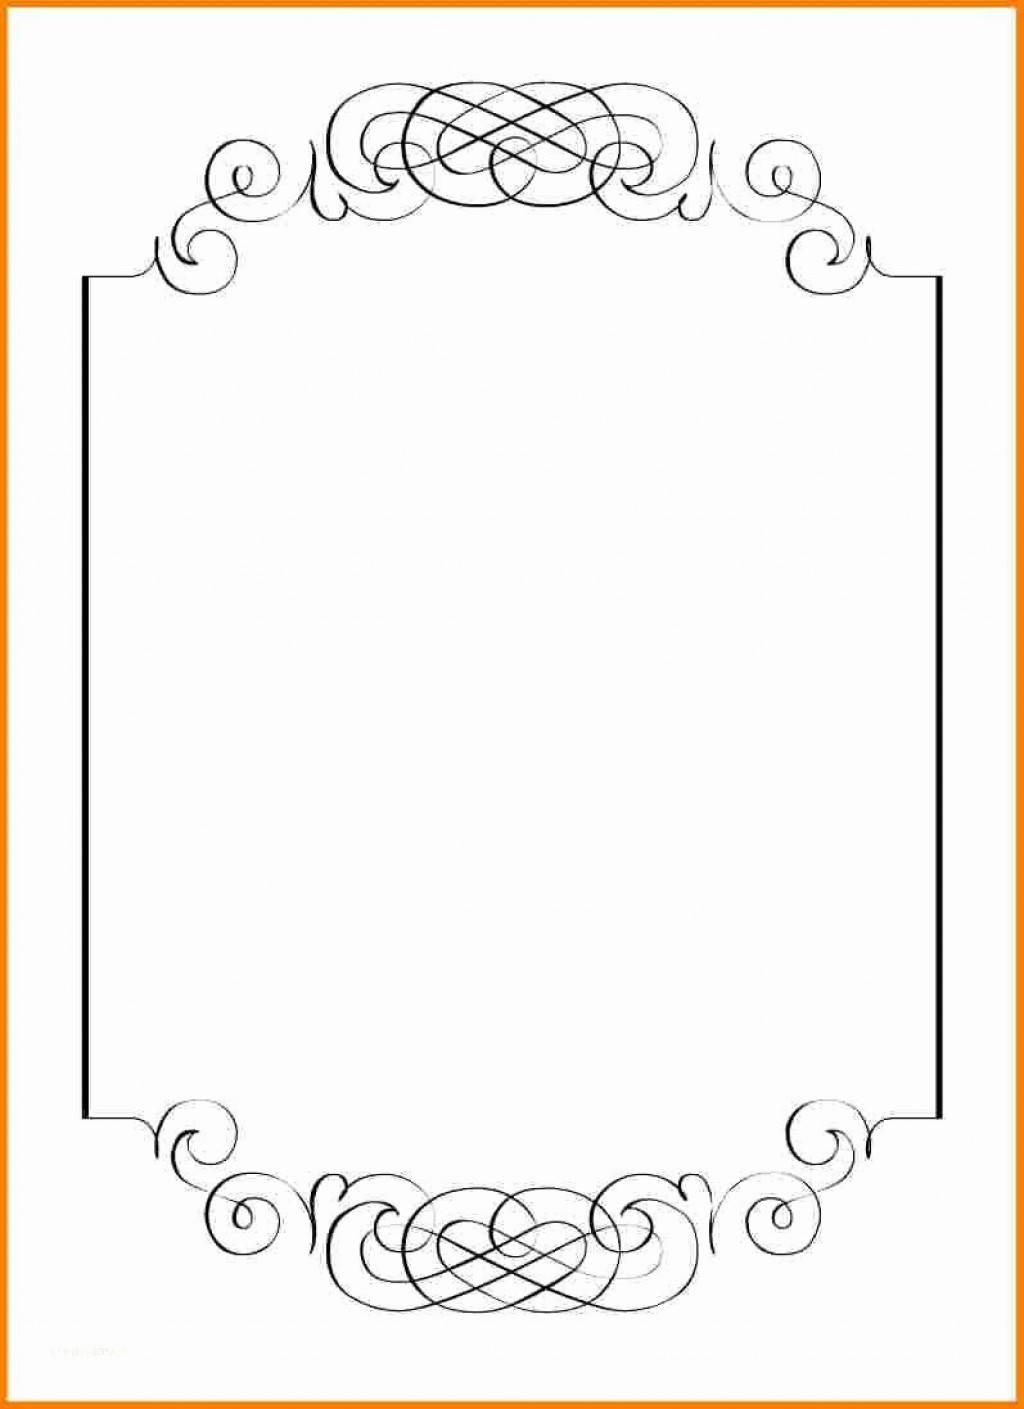 000 Fascinating M Word Invitation Template Concept  Microsoft Card Wedding Free Download EditableLarge